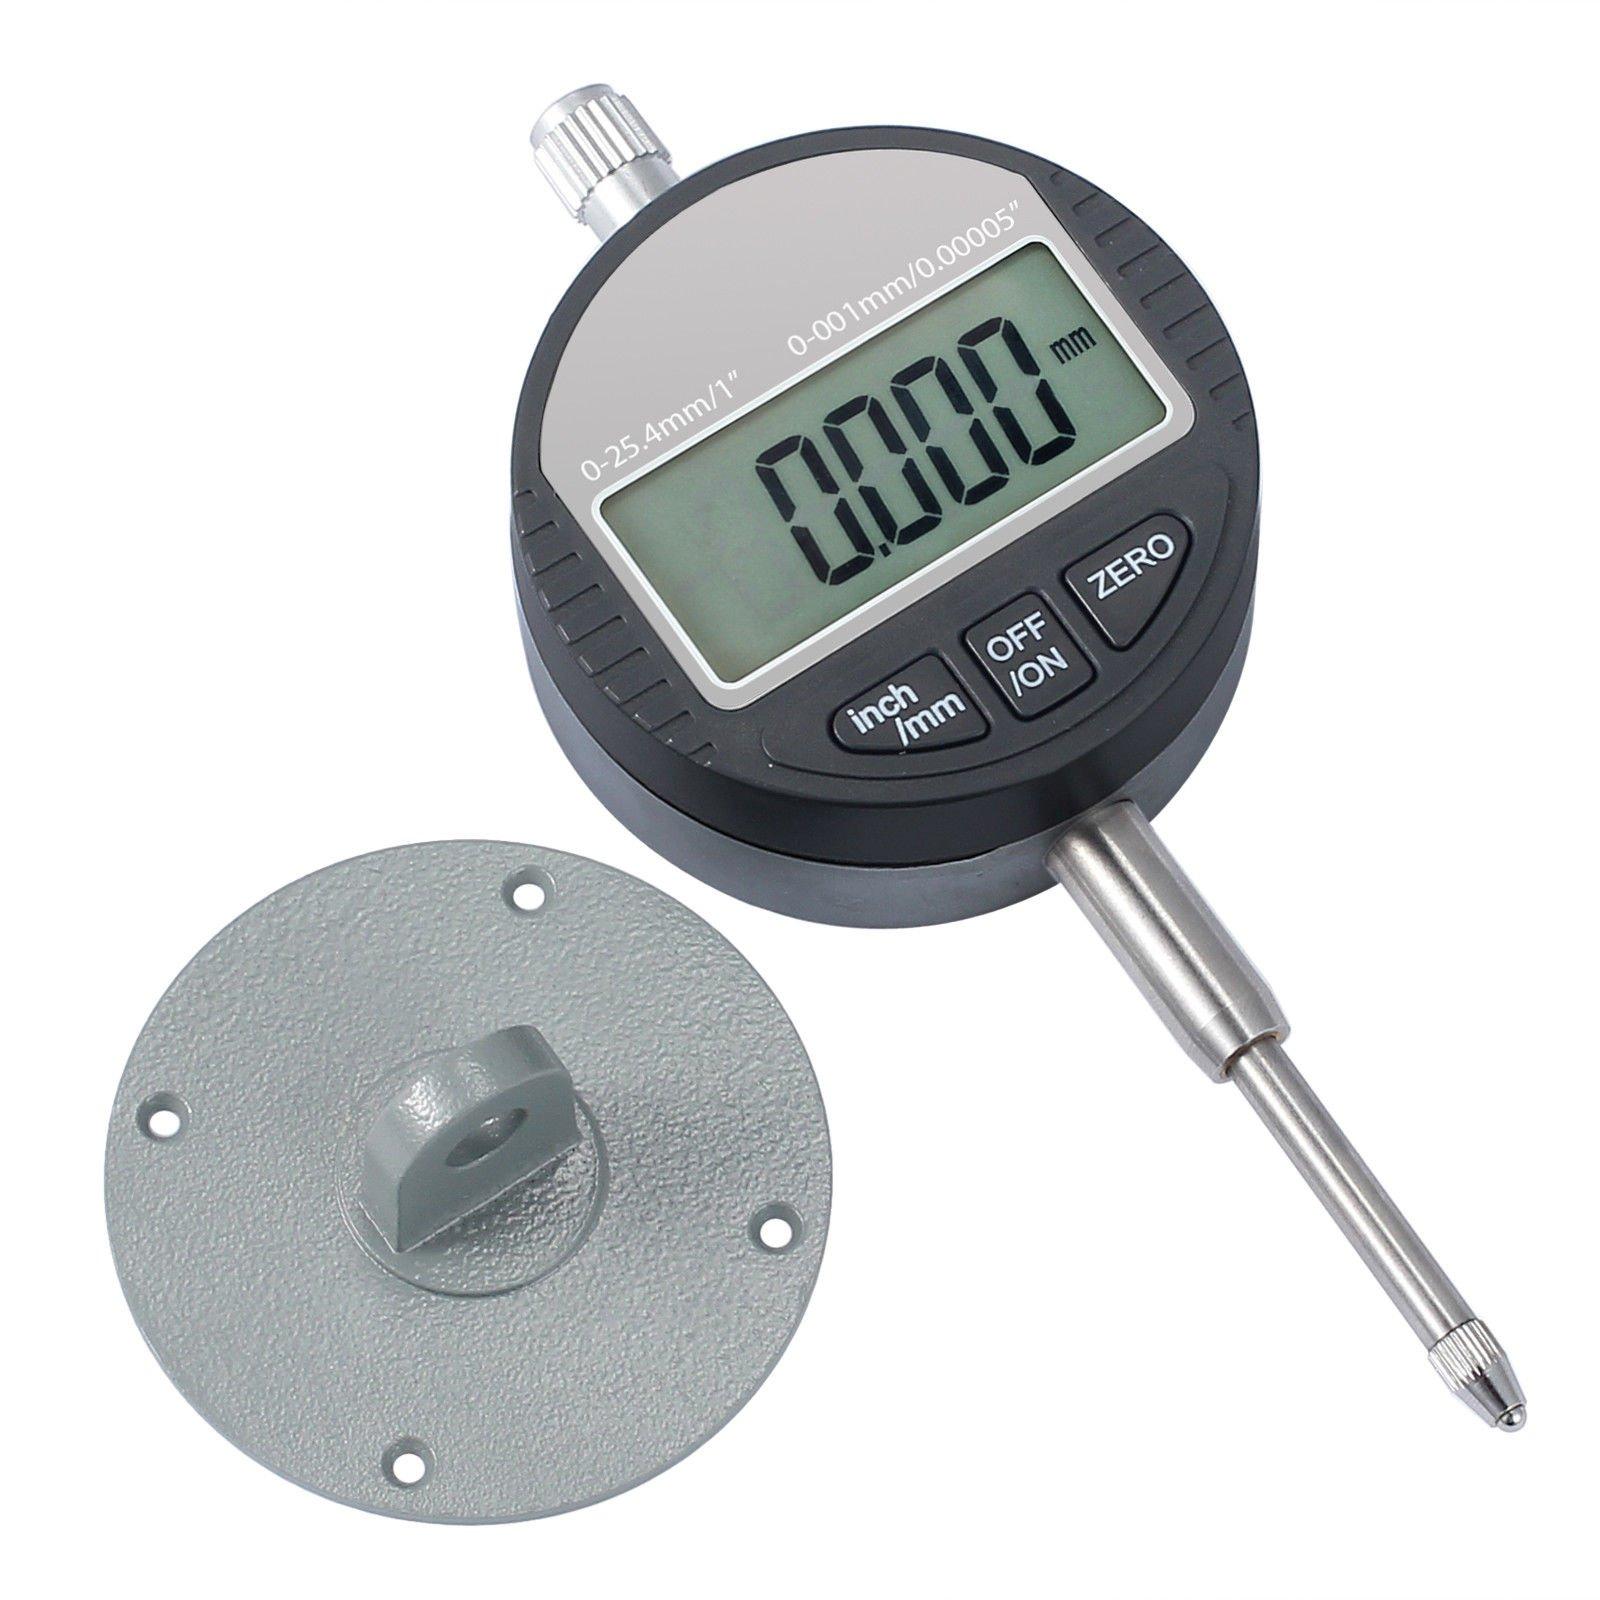 AUTOUTLET Digital Dial Indicator Probe 0.001mm/0.00005'' Range DTI Gauge Dial Test Indicator 25.4mm/1'' High-precision Measurement Industrial Indicators